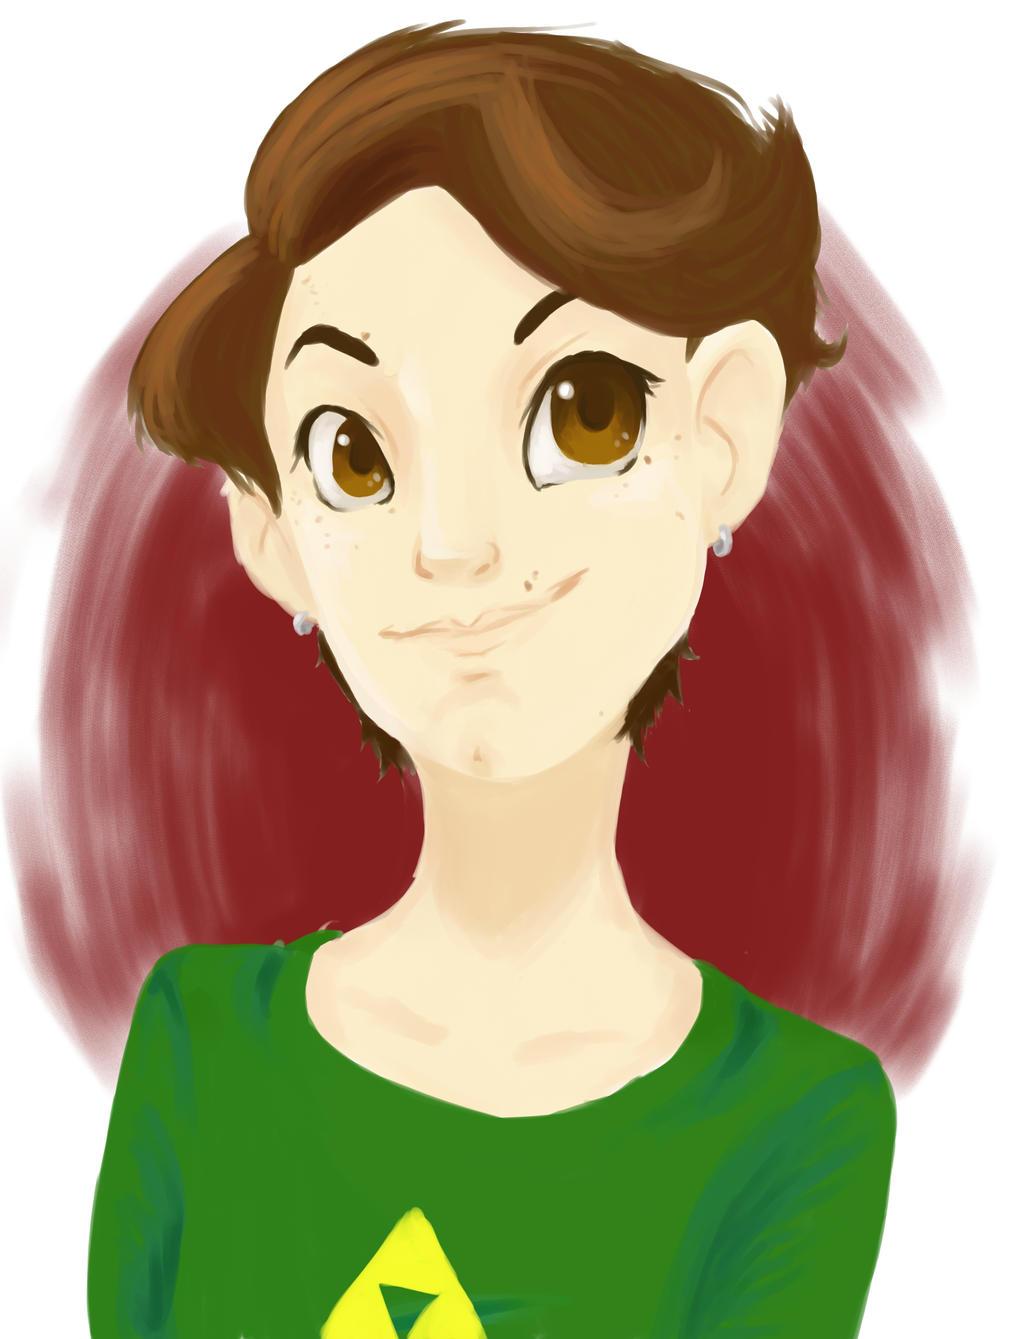 ReeRocksStuff's Profile Picture